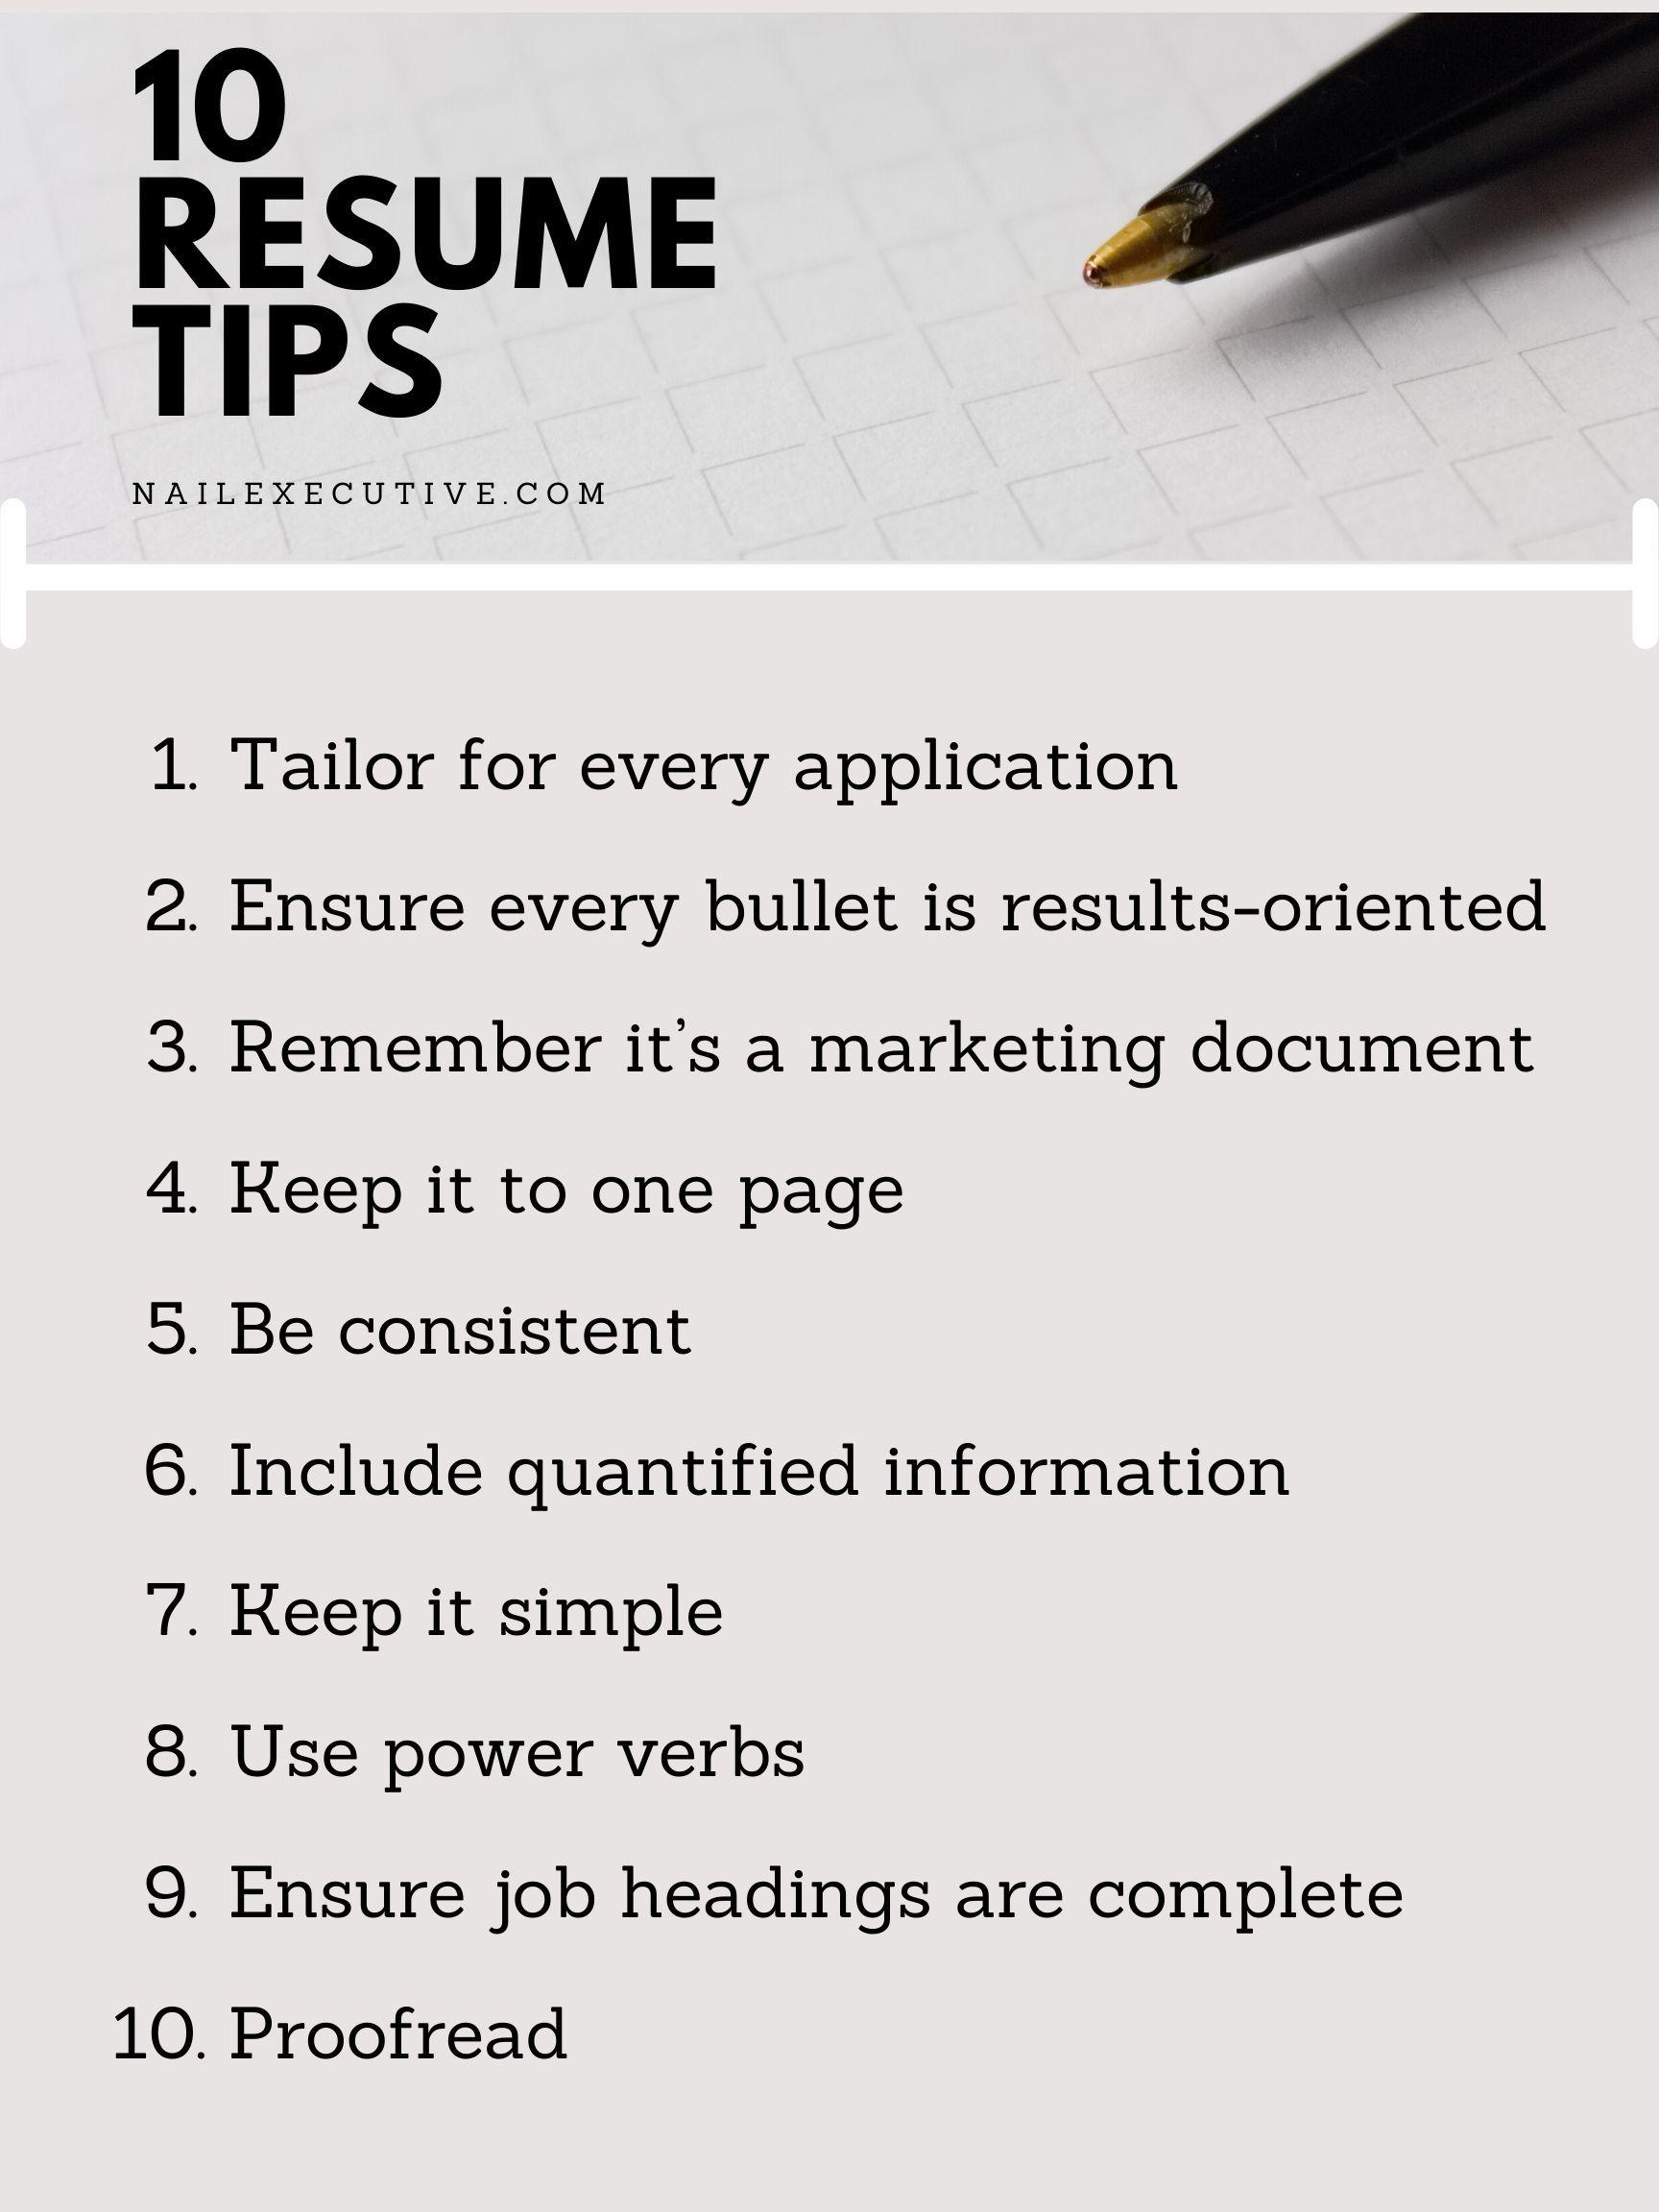 Top Resume Tips in 2020 Resume tips, Resume, Tips